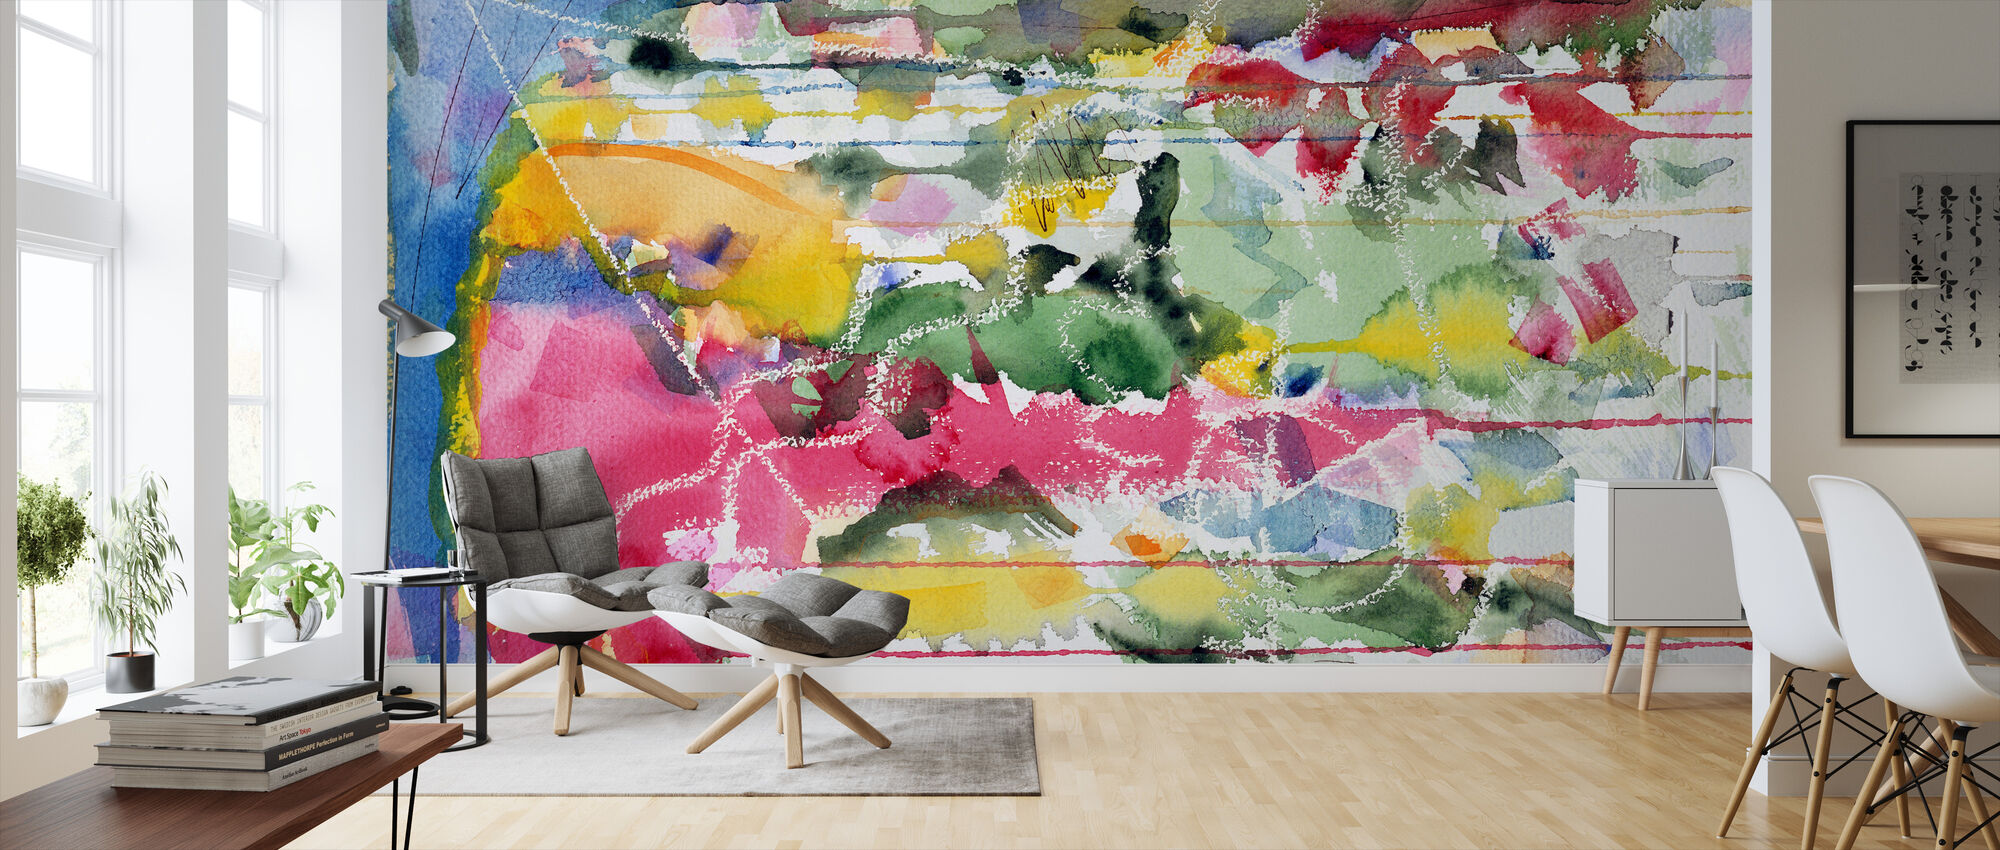 Blue Monday Dreaming - Mark Ari - Wallpaper - Living Room